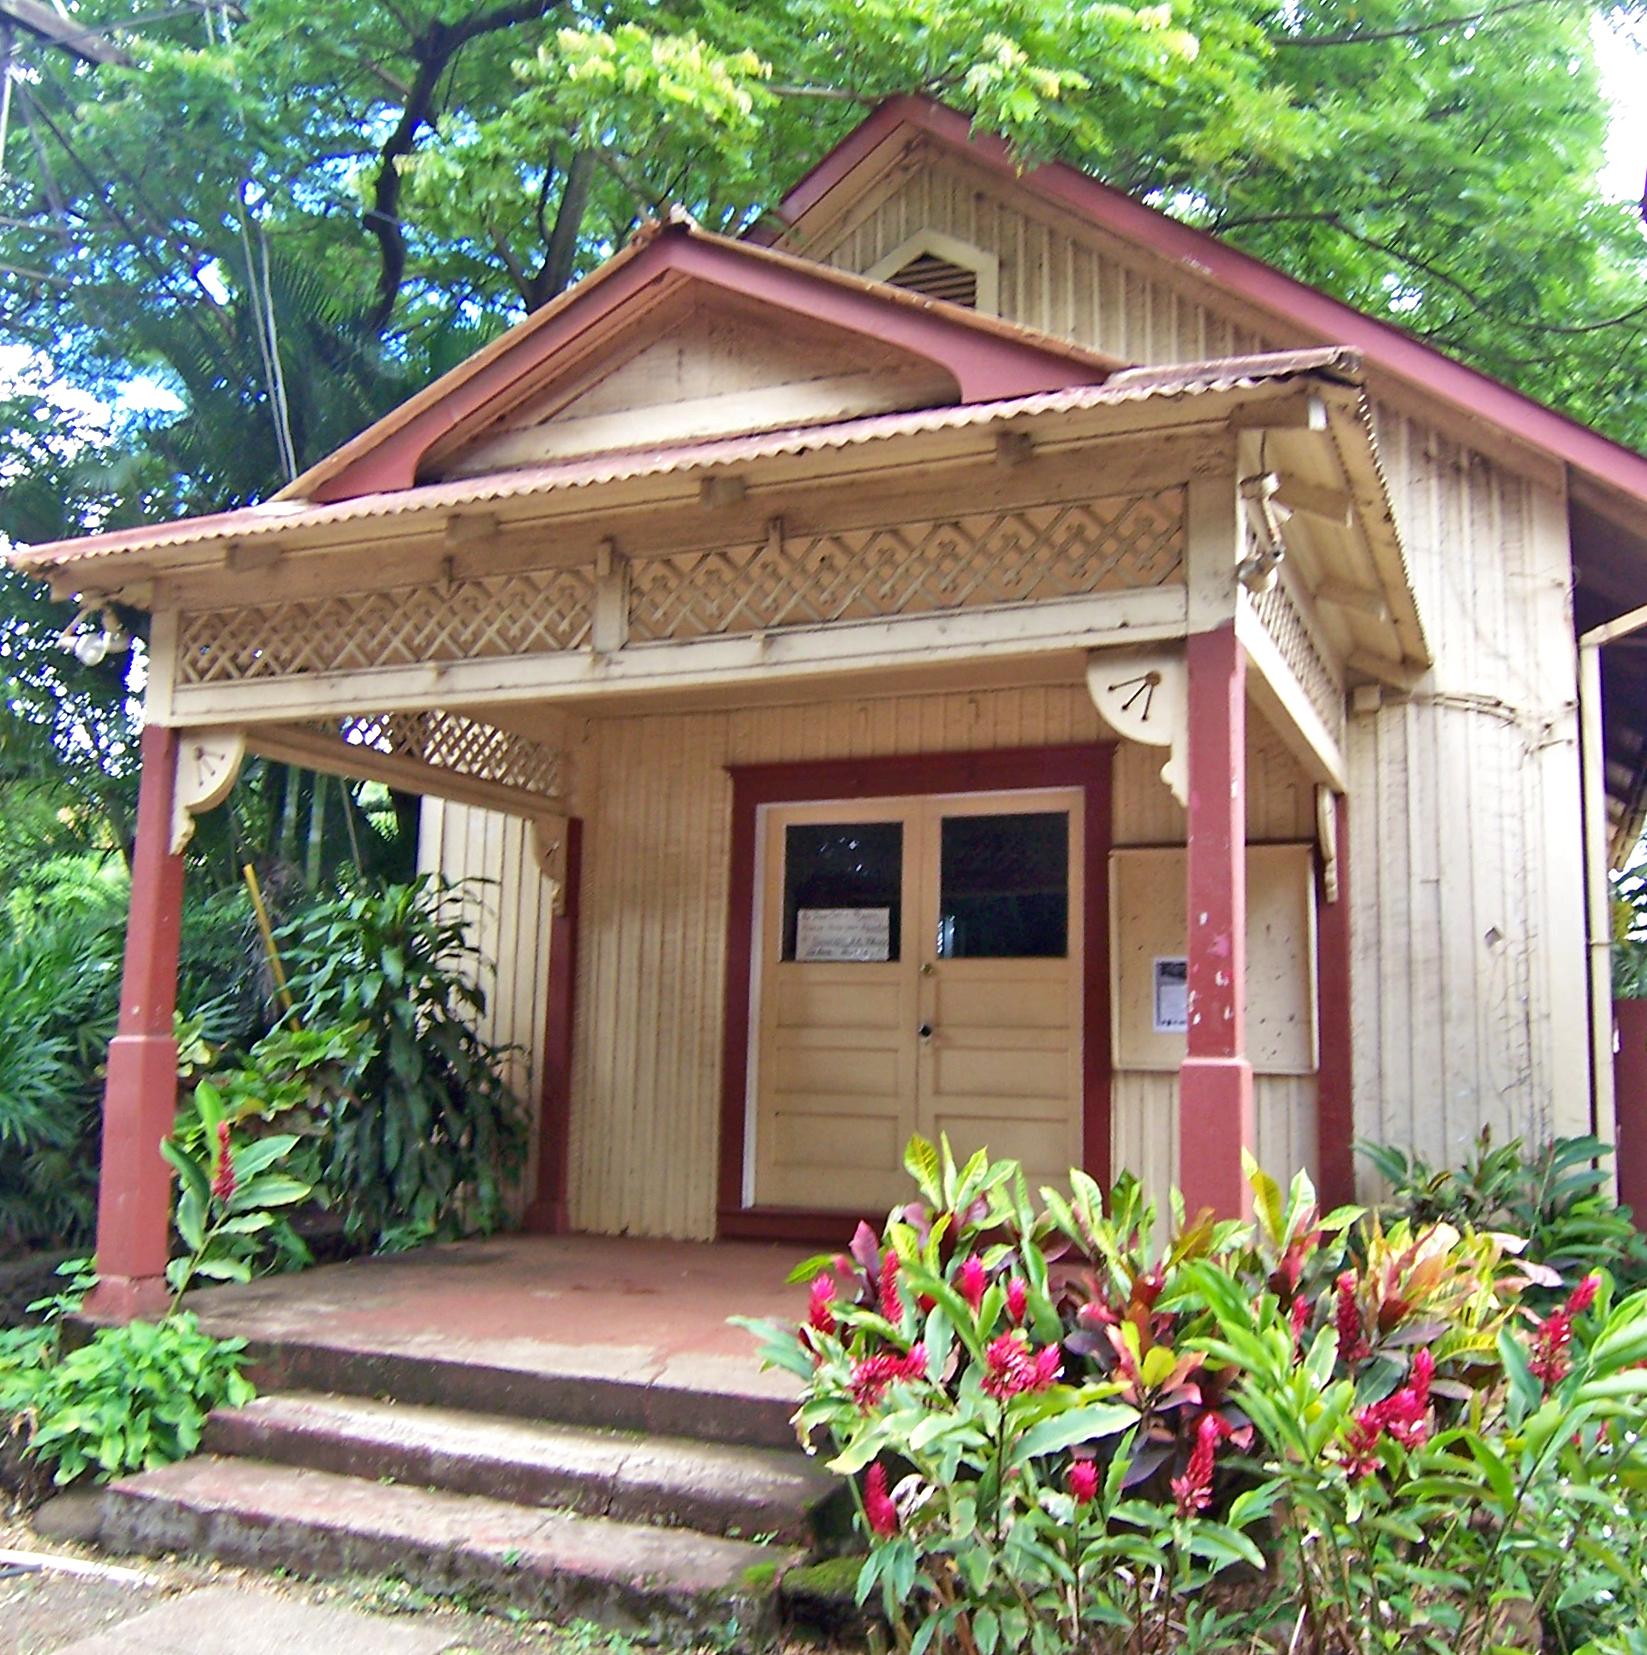 Terence-Faircloths-Plantation-Cottage-on-Kauai